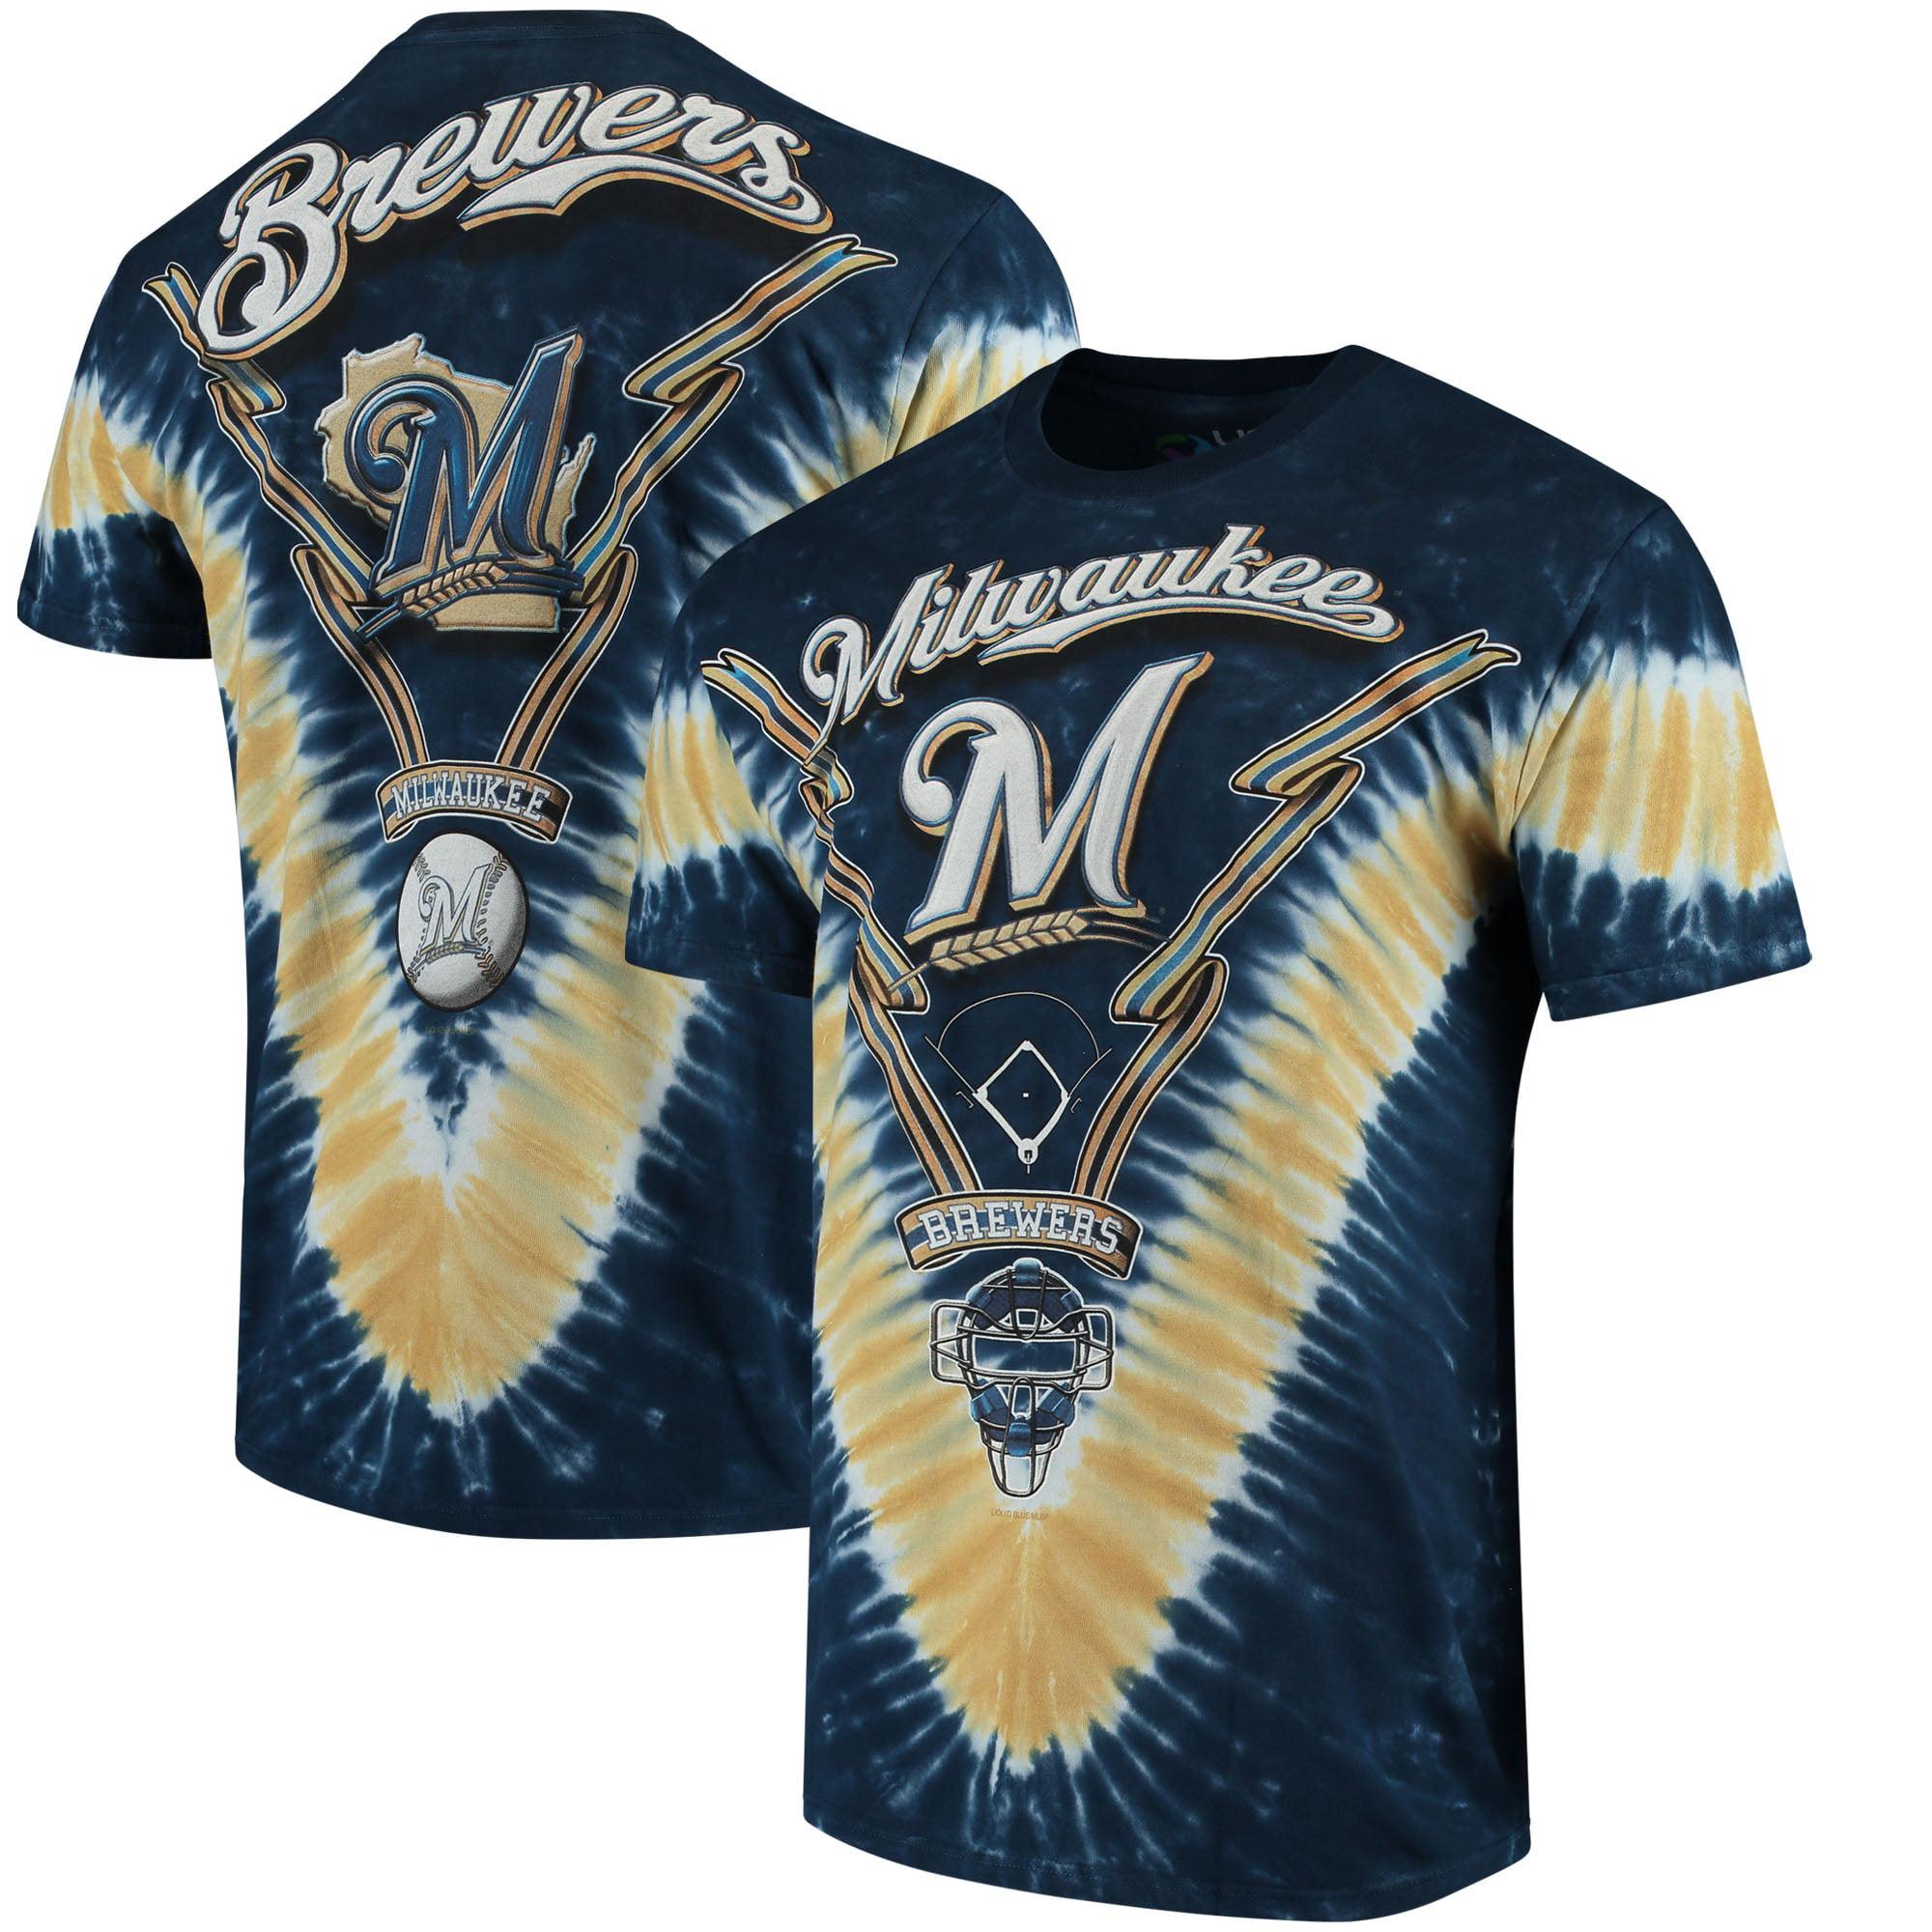 Milwaukee Brewers V Tie-Dye T-Shirt - Navy/Gold